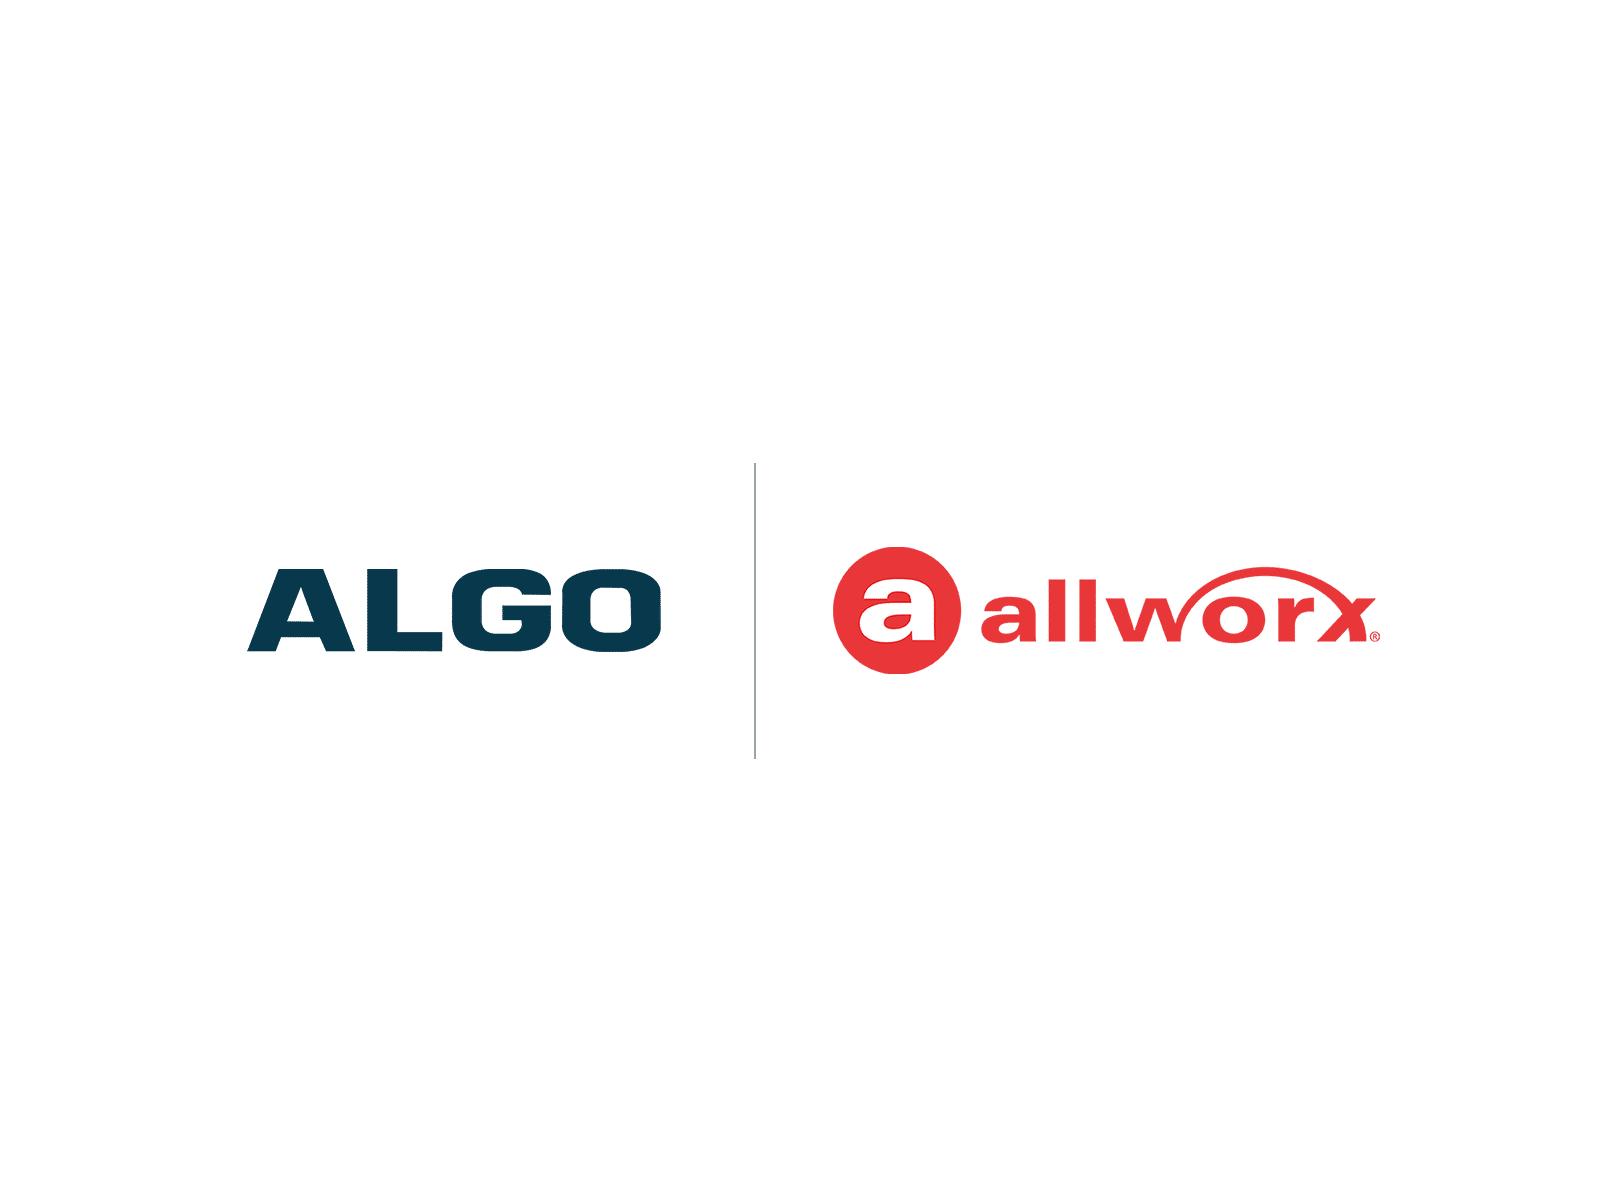 Algo Allworx Compatibility Logo